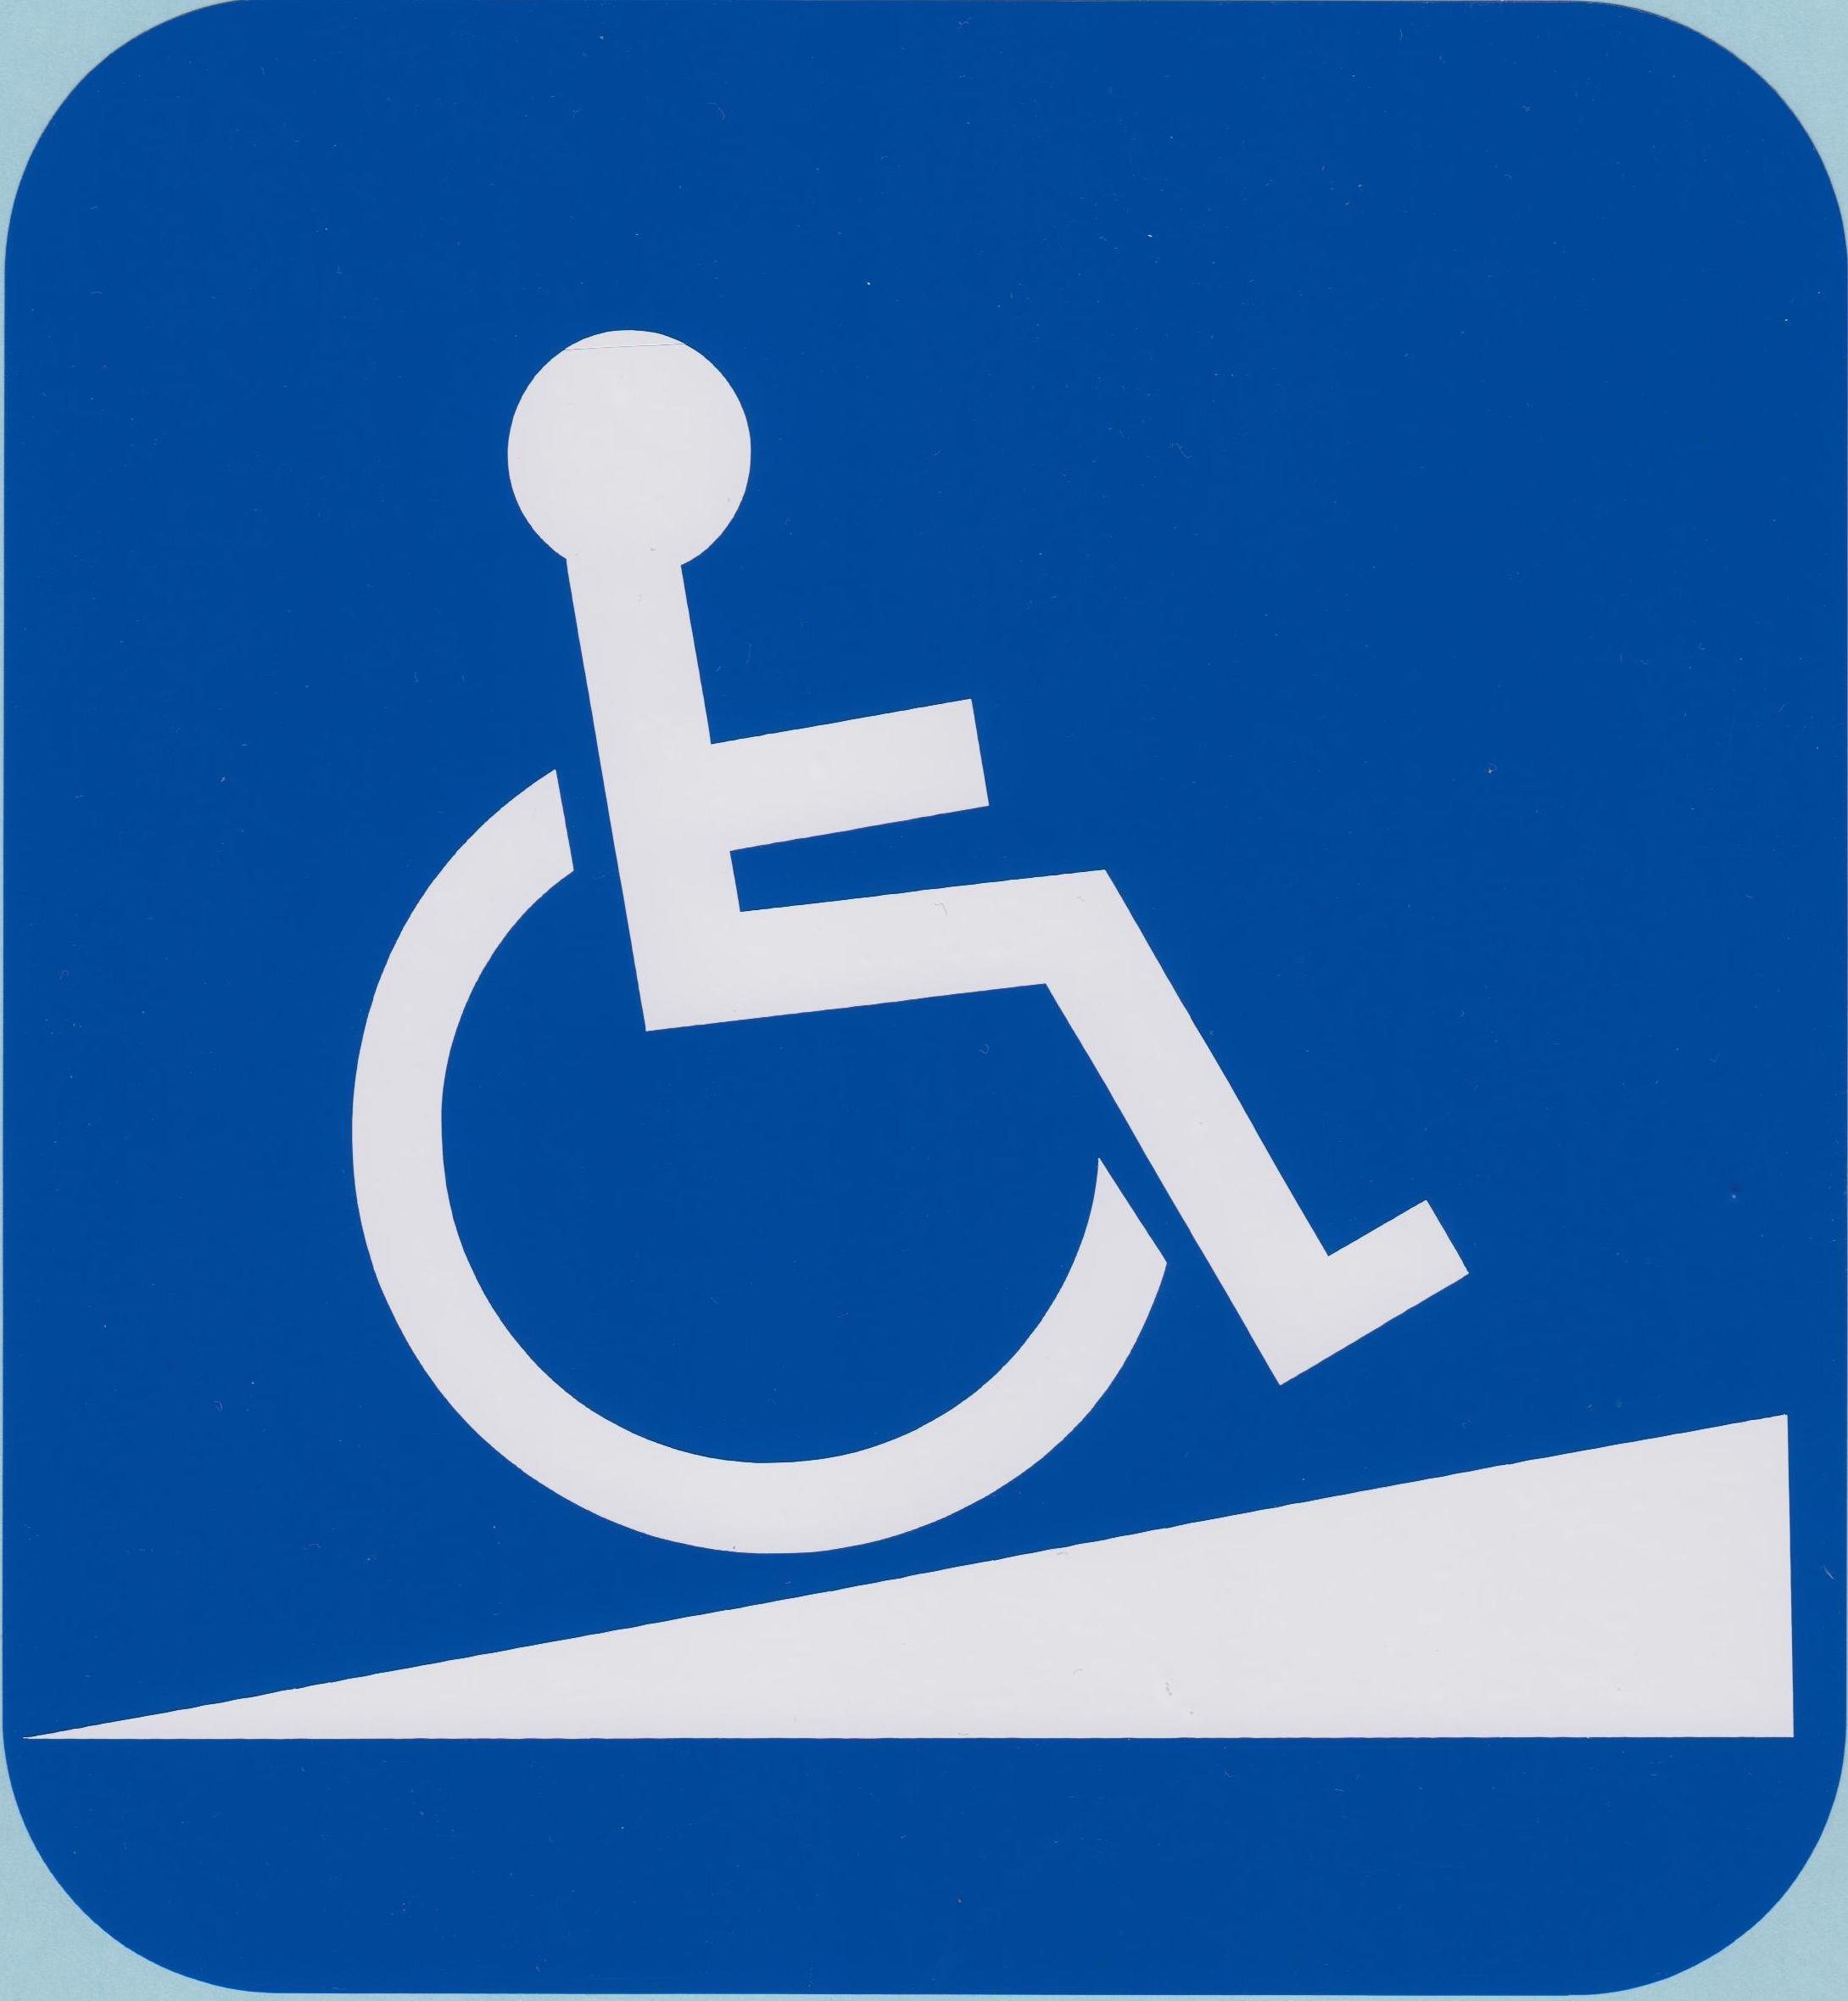 handicap symbol clip art - photo #45